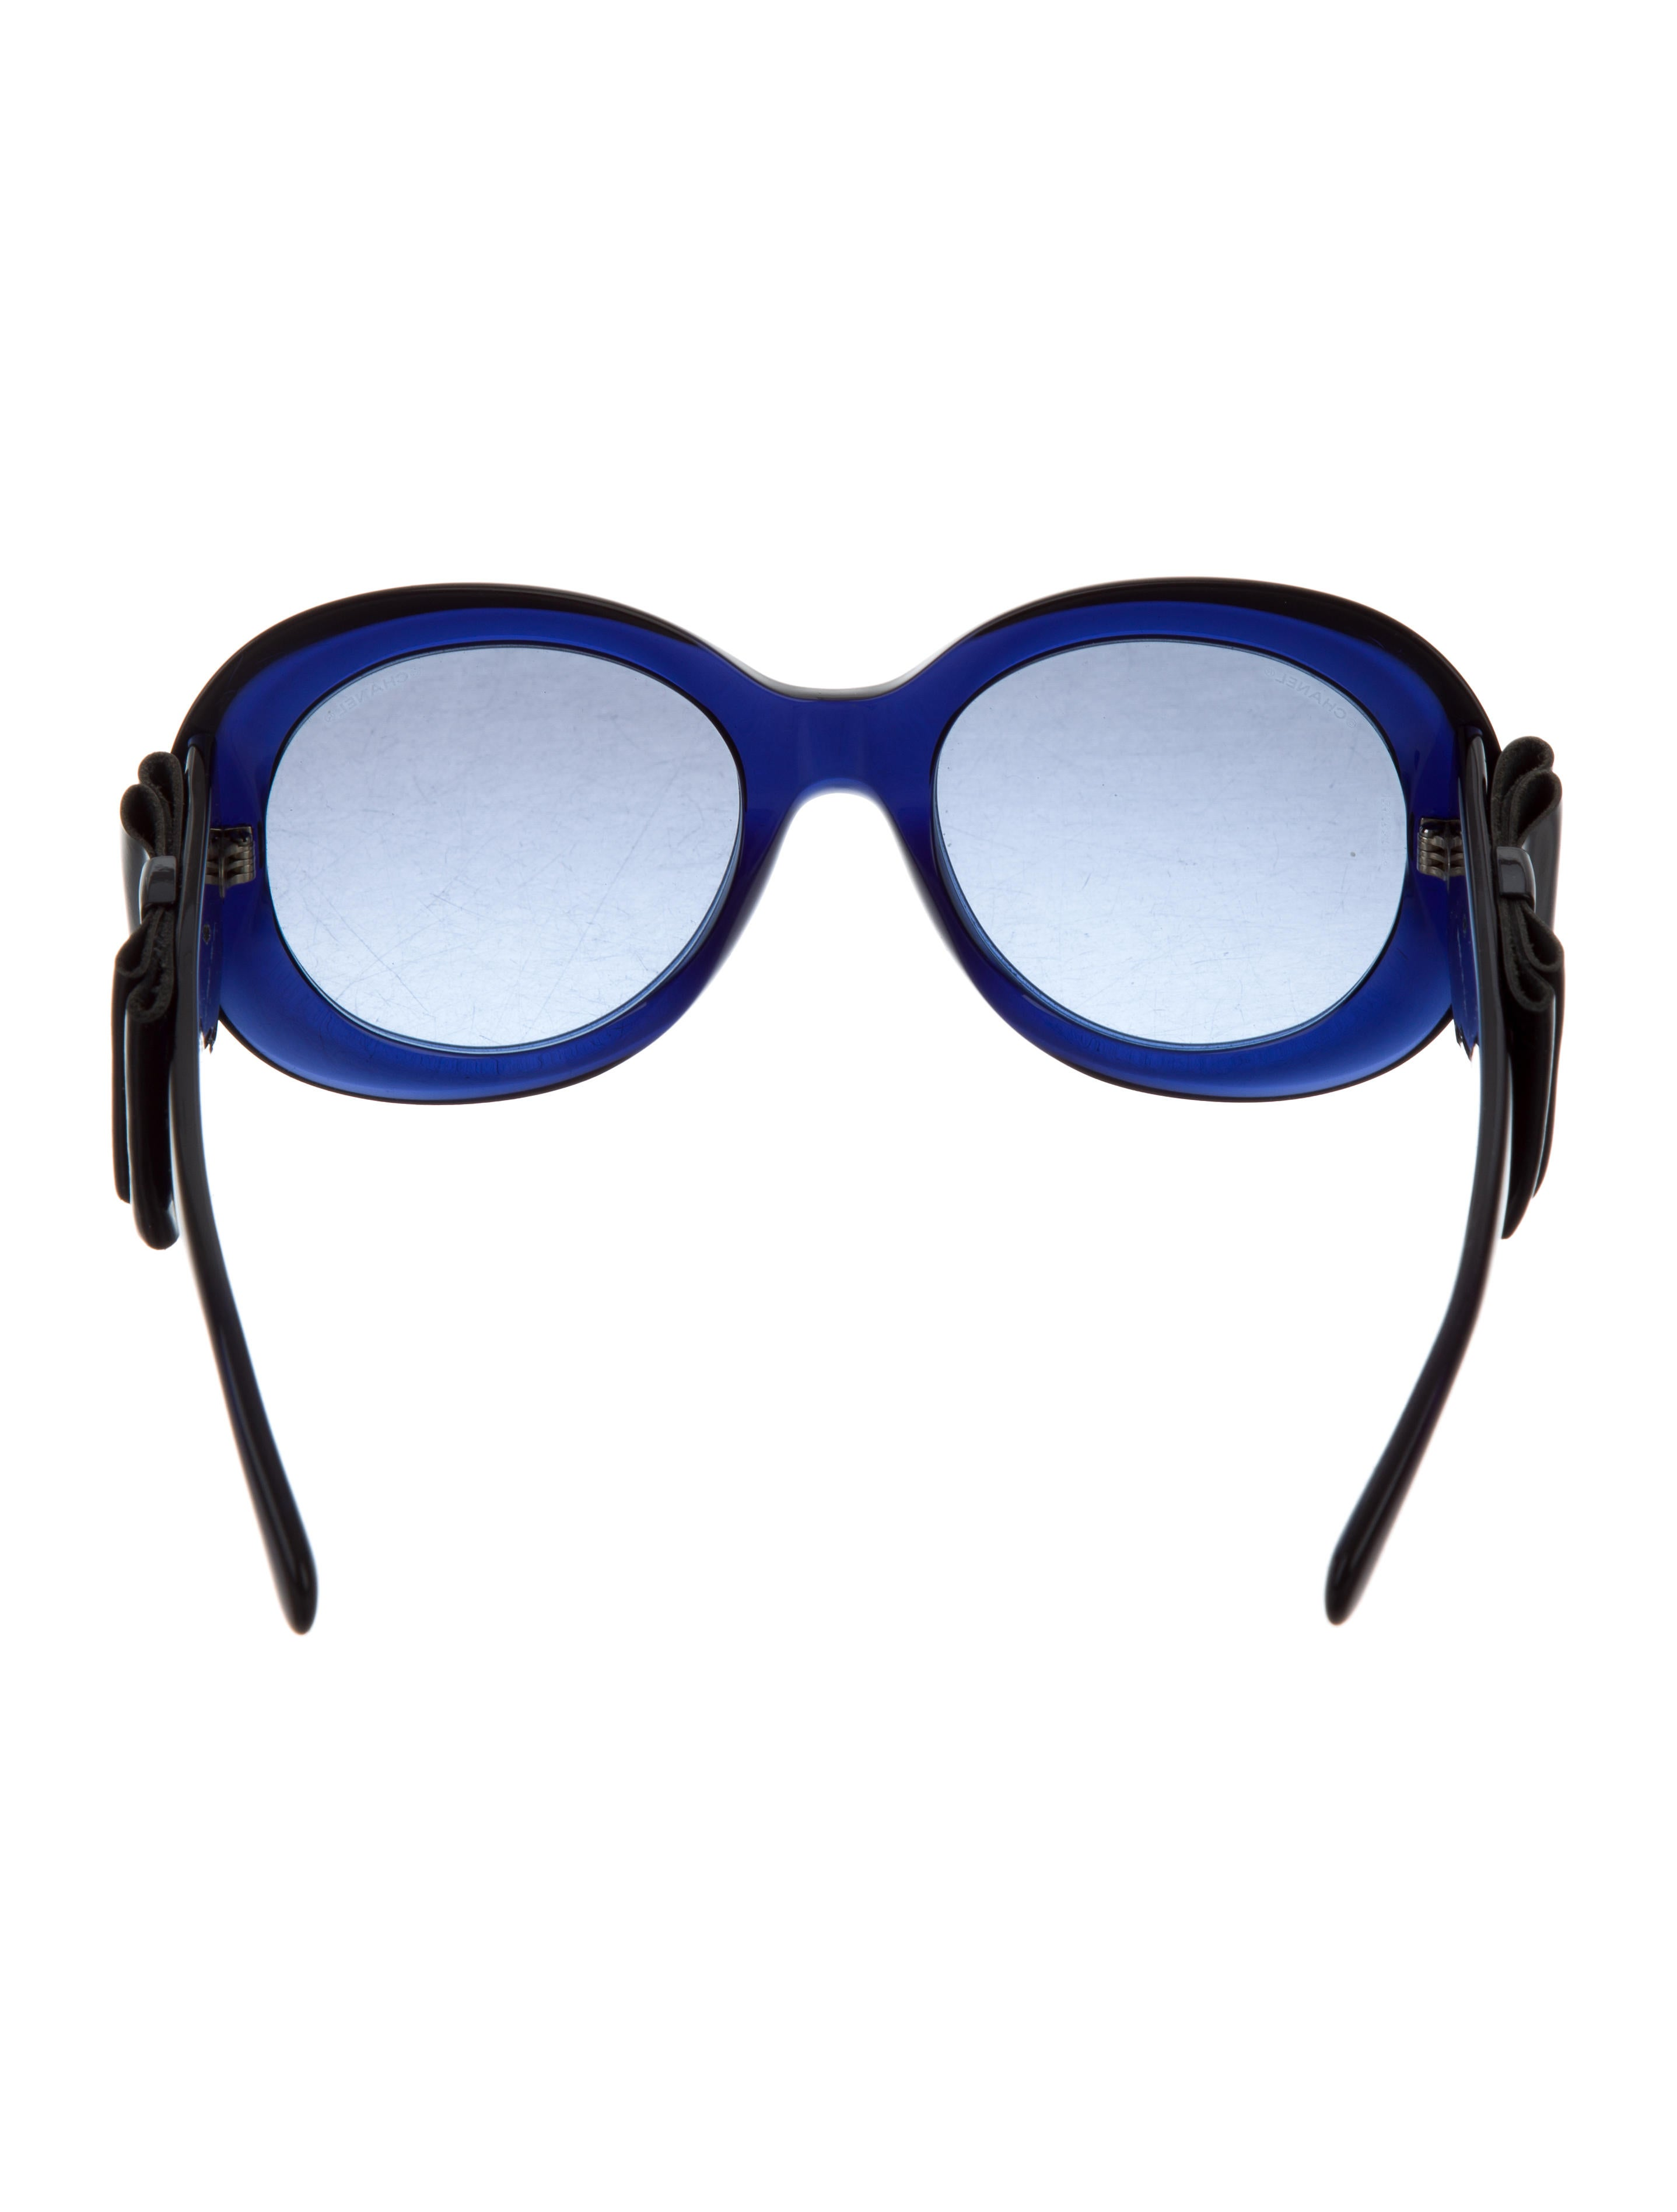 chanel oversize bow sunglasses accessories cha192782